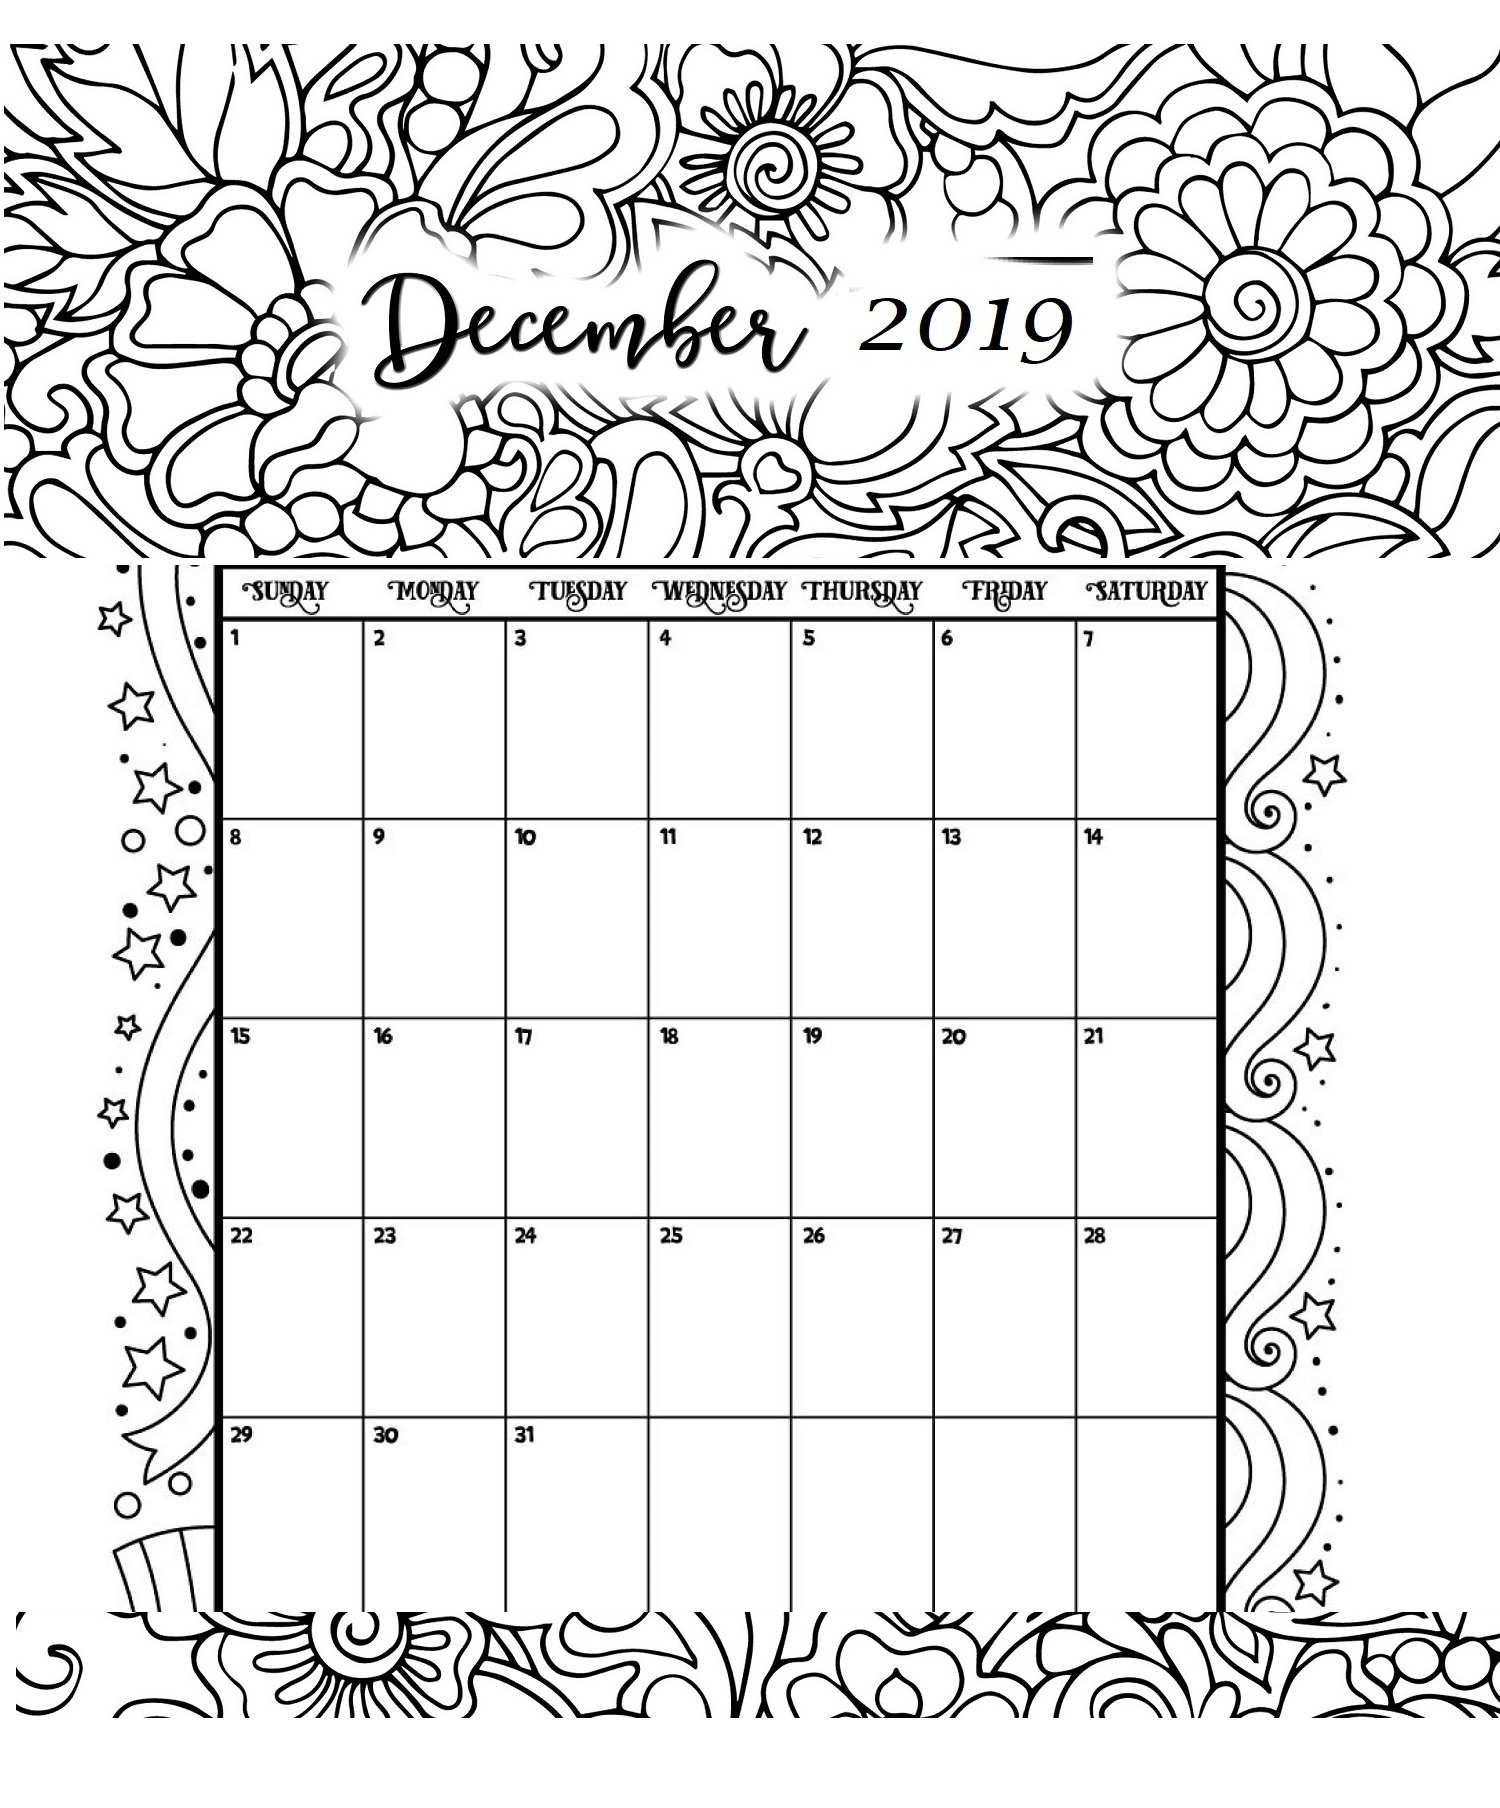 December Printable Coloring Calendar